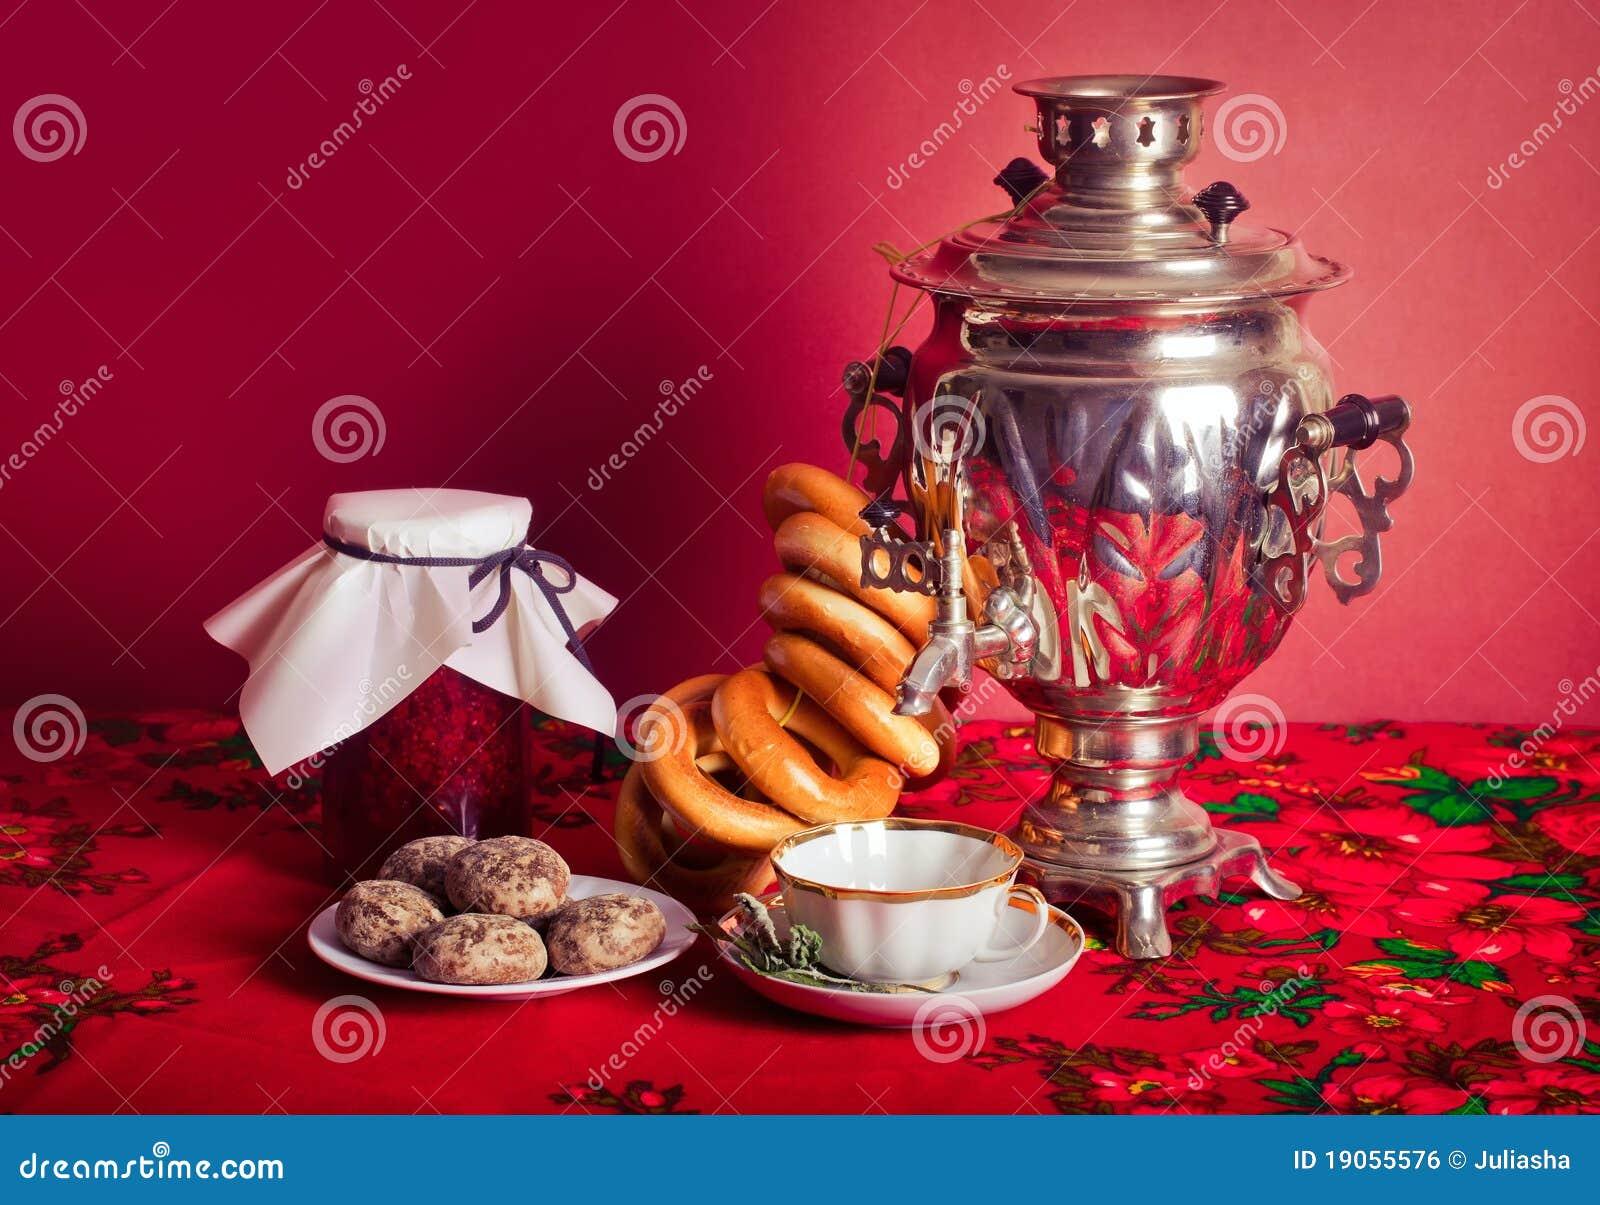 russian tea royalty free stock image image 19055576. Black Bedroom Furniture Sets. Home Design Ideas